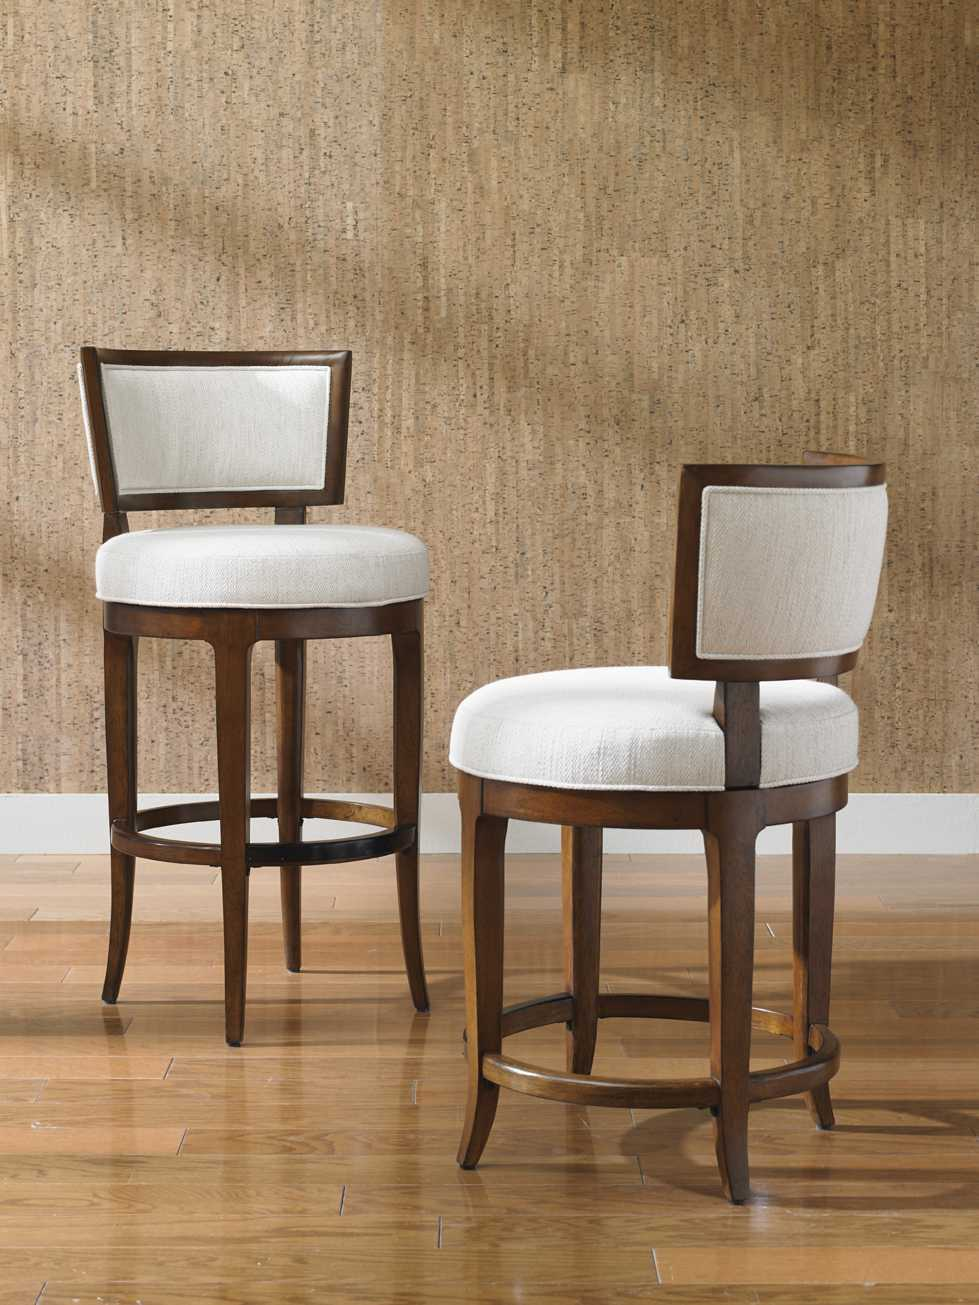 lounge chair cushions clearance office chairs mesh tommy bahama island fusion macau swivel sebana bar stool | to55681602